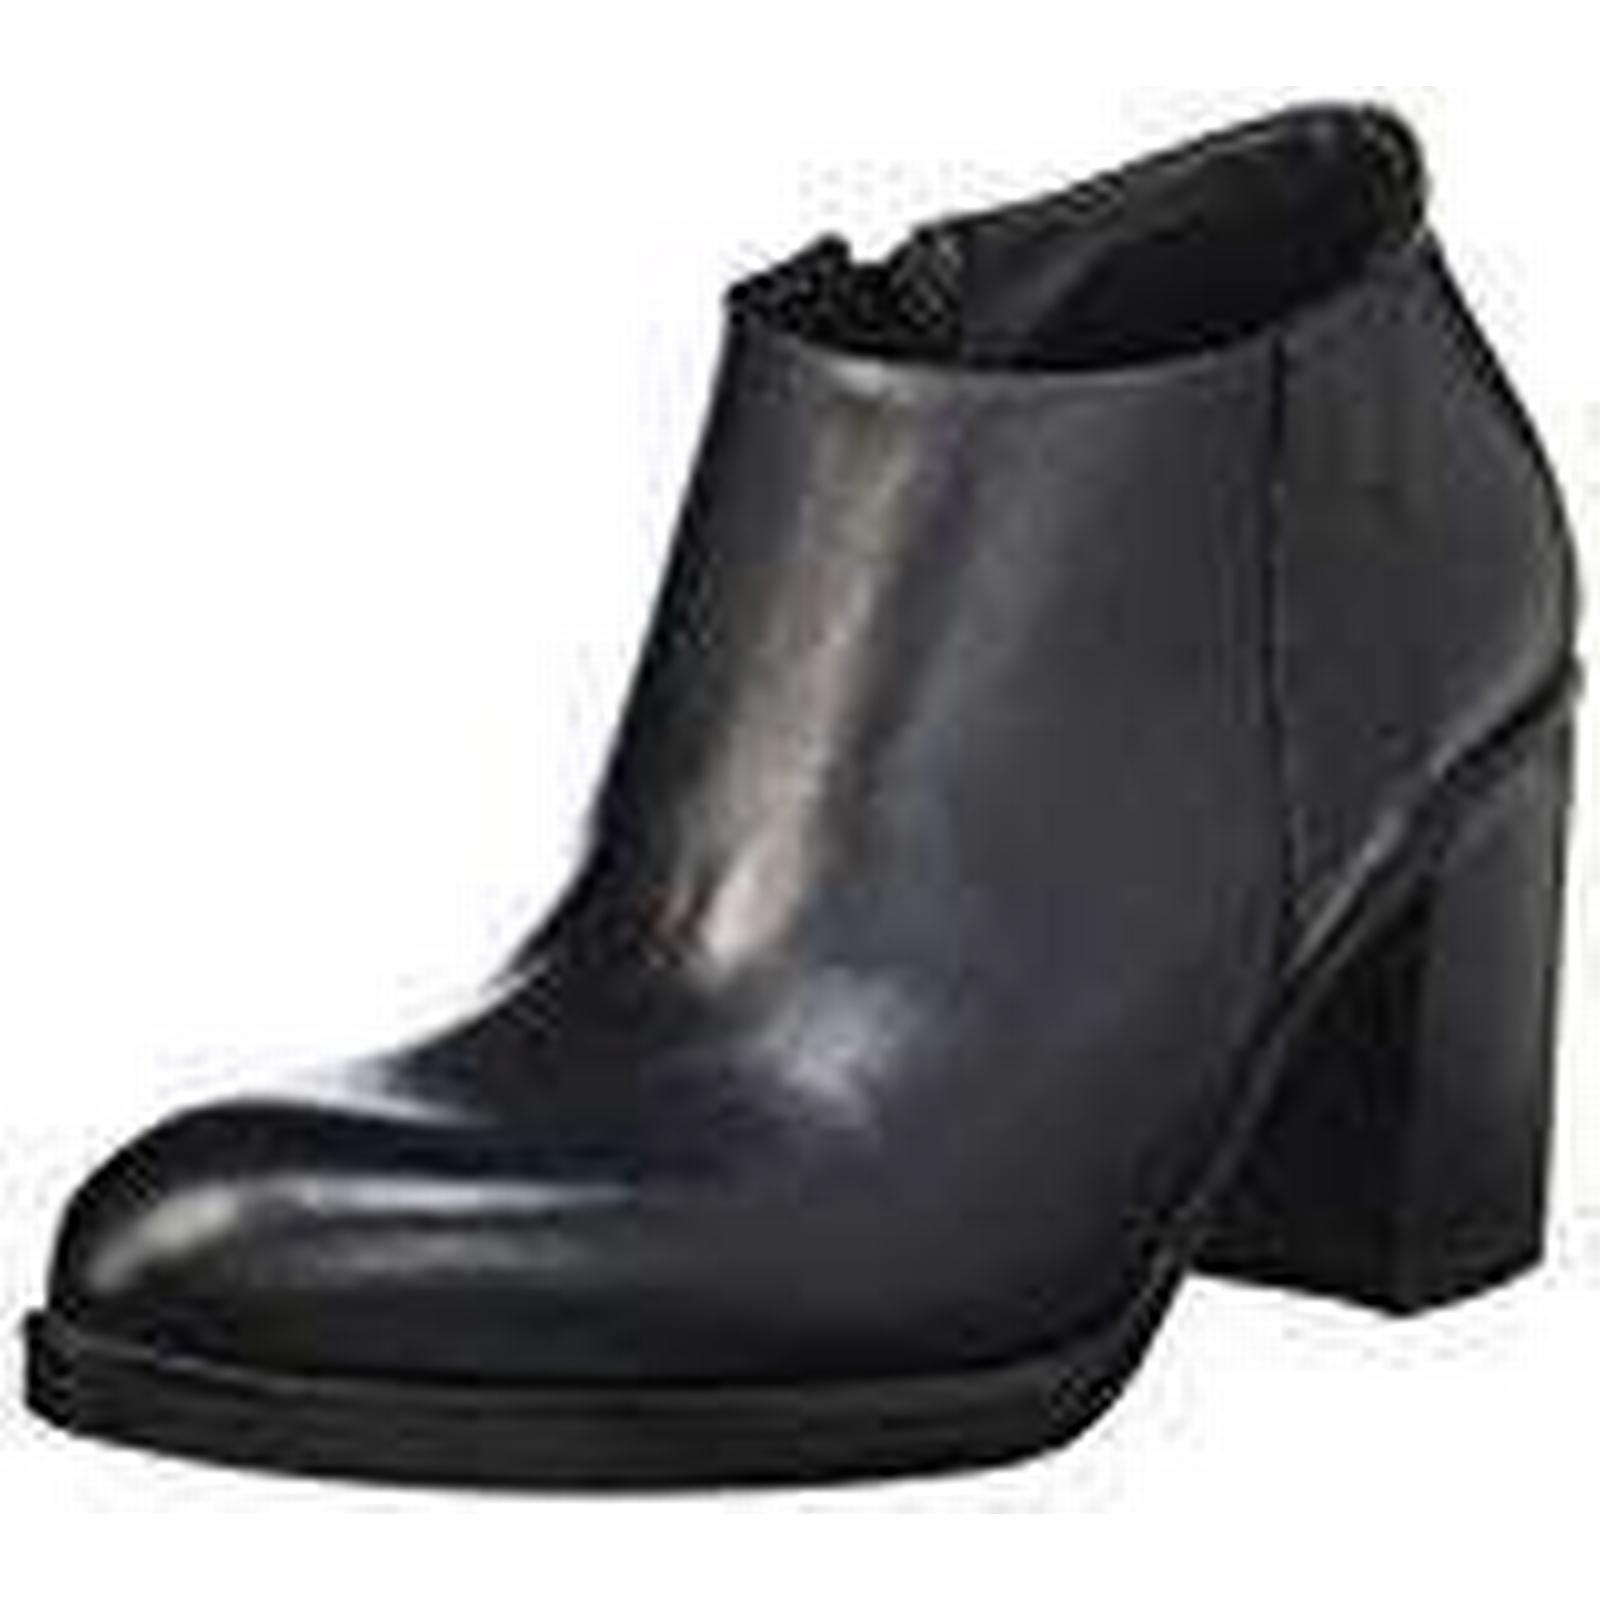 LiliMill Women's Mirel ShortMirel Short ), Boots, black ( Nero ), Short Size: 6 UK 5d474a